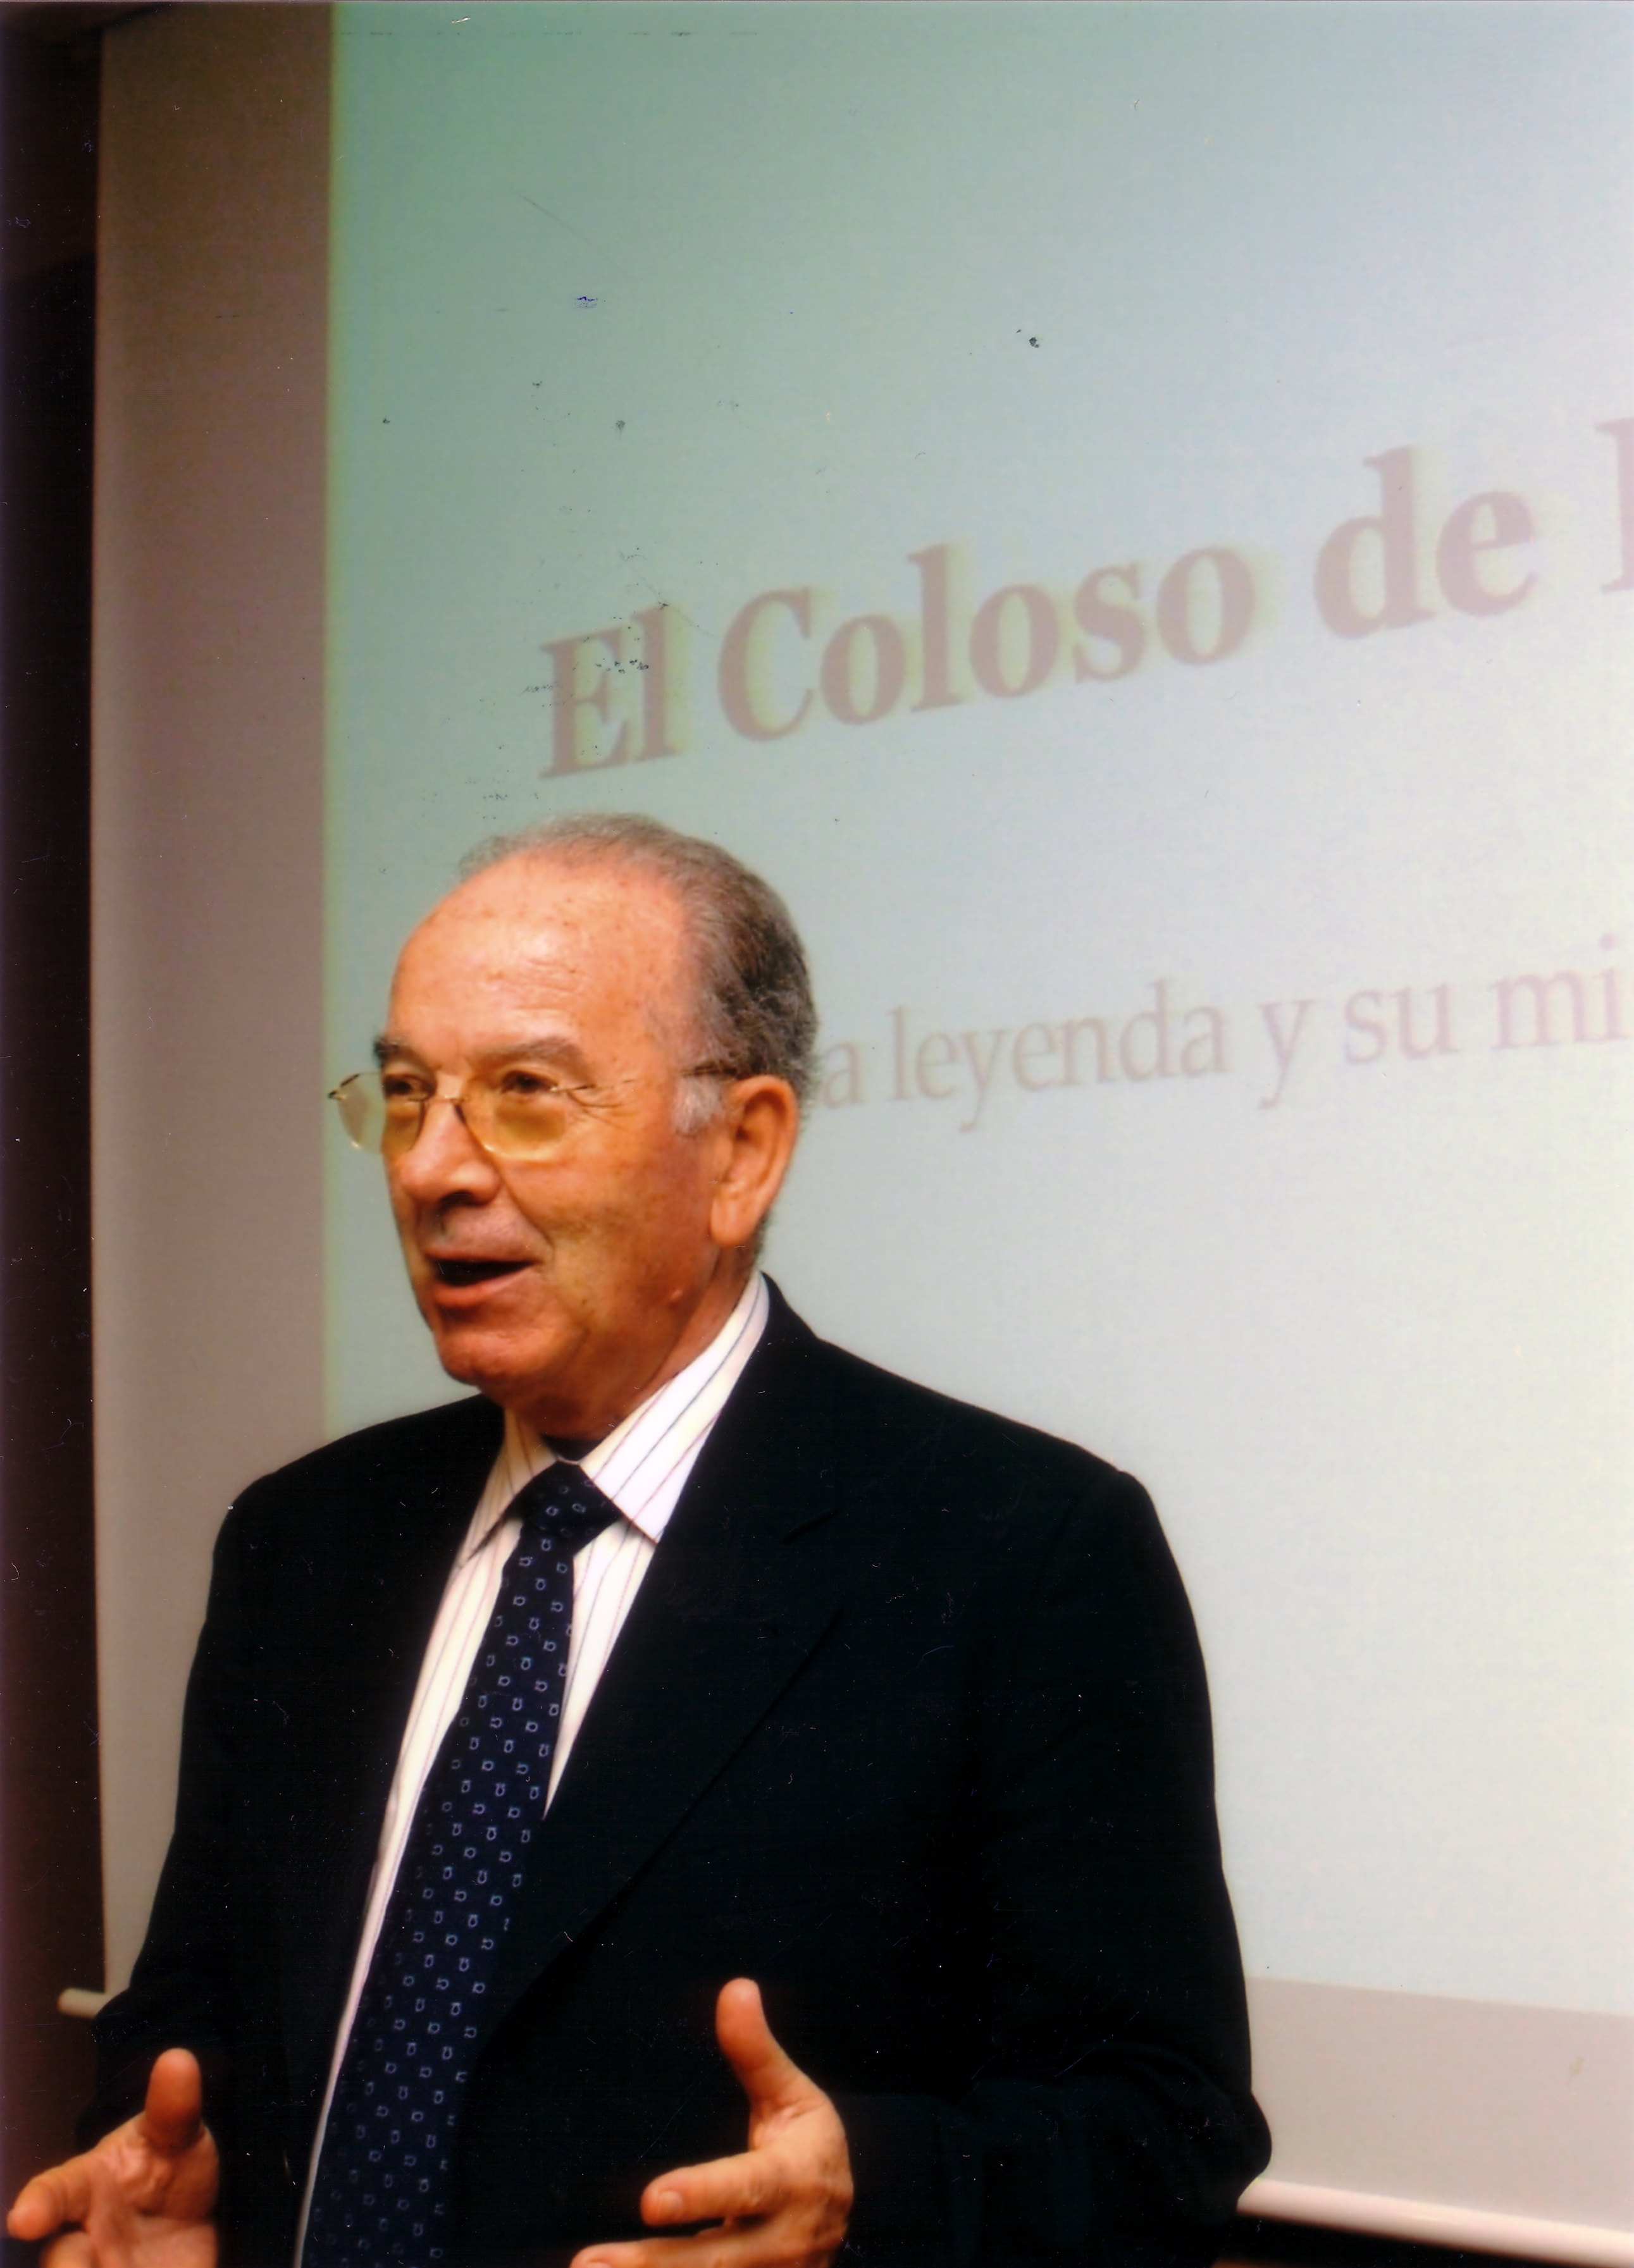 2004 CURSO MARAVILLAS MUNDO